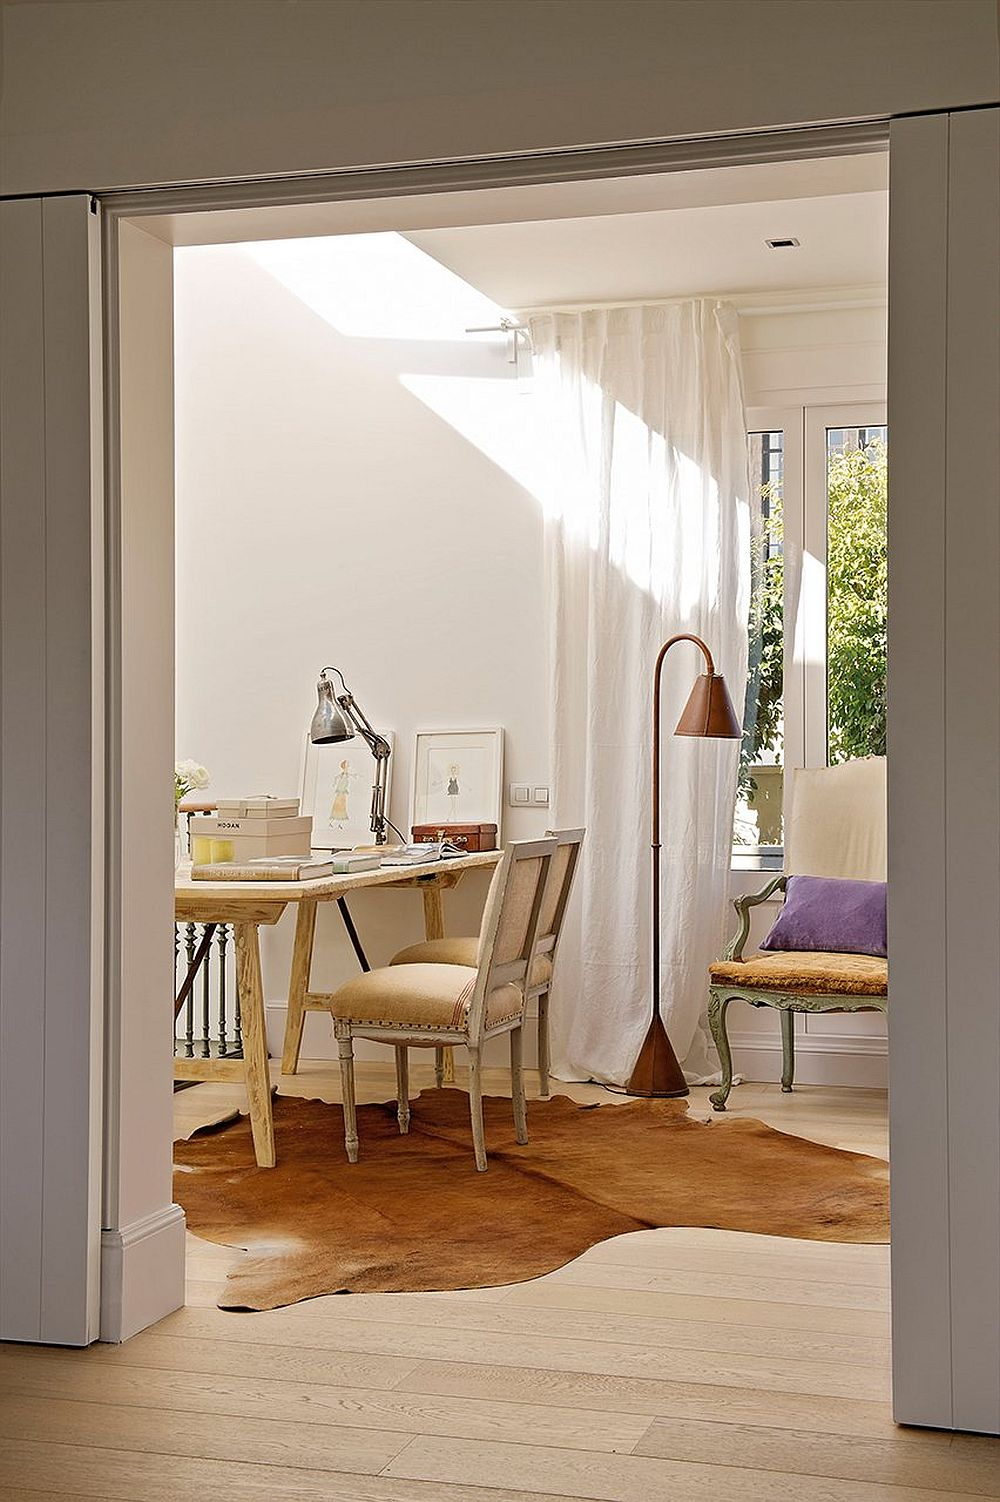 adelaparvu.com despre casa veche renovata, arhitect Albert Blanch, designer Gaby Conde, Foto ElMueble (25)